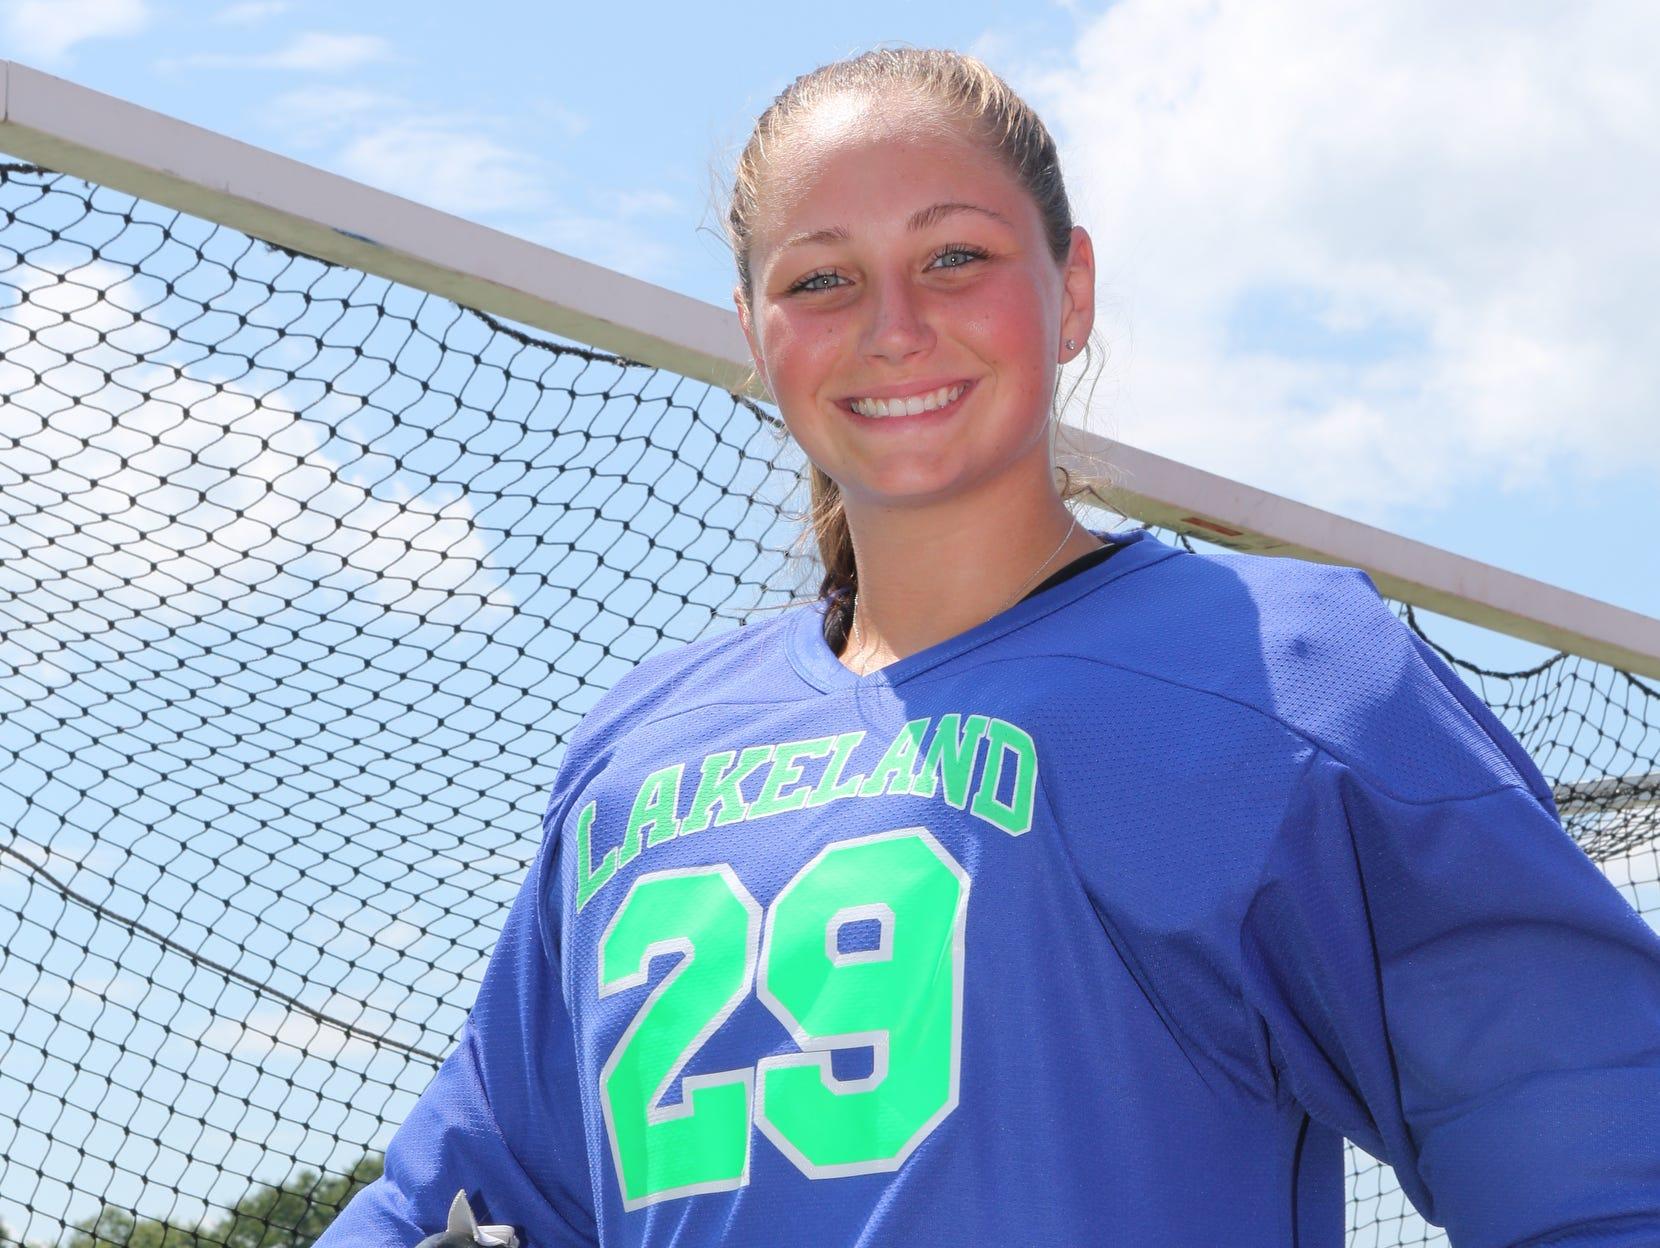 Former Lakeland field hockey goalie and U.S. Under-19 National team member Alex Halpin poses at the Putnam Valley High School July 21, 2015.